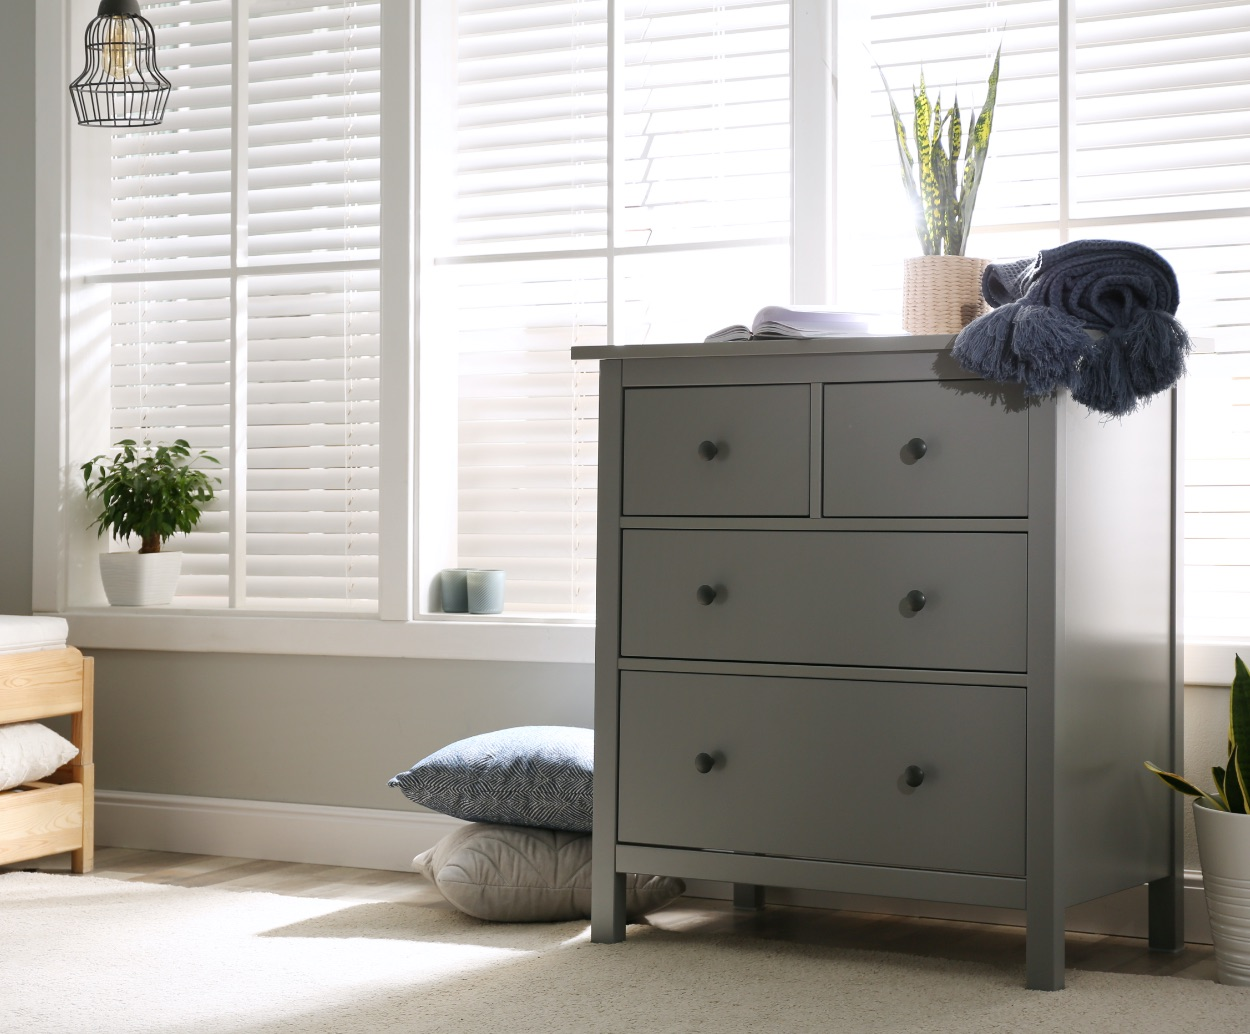 Foil Laminate Furniture   4-Drawer Dresser   Decorative Paper